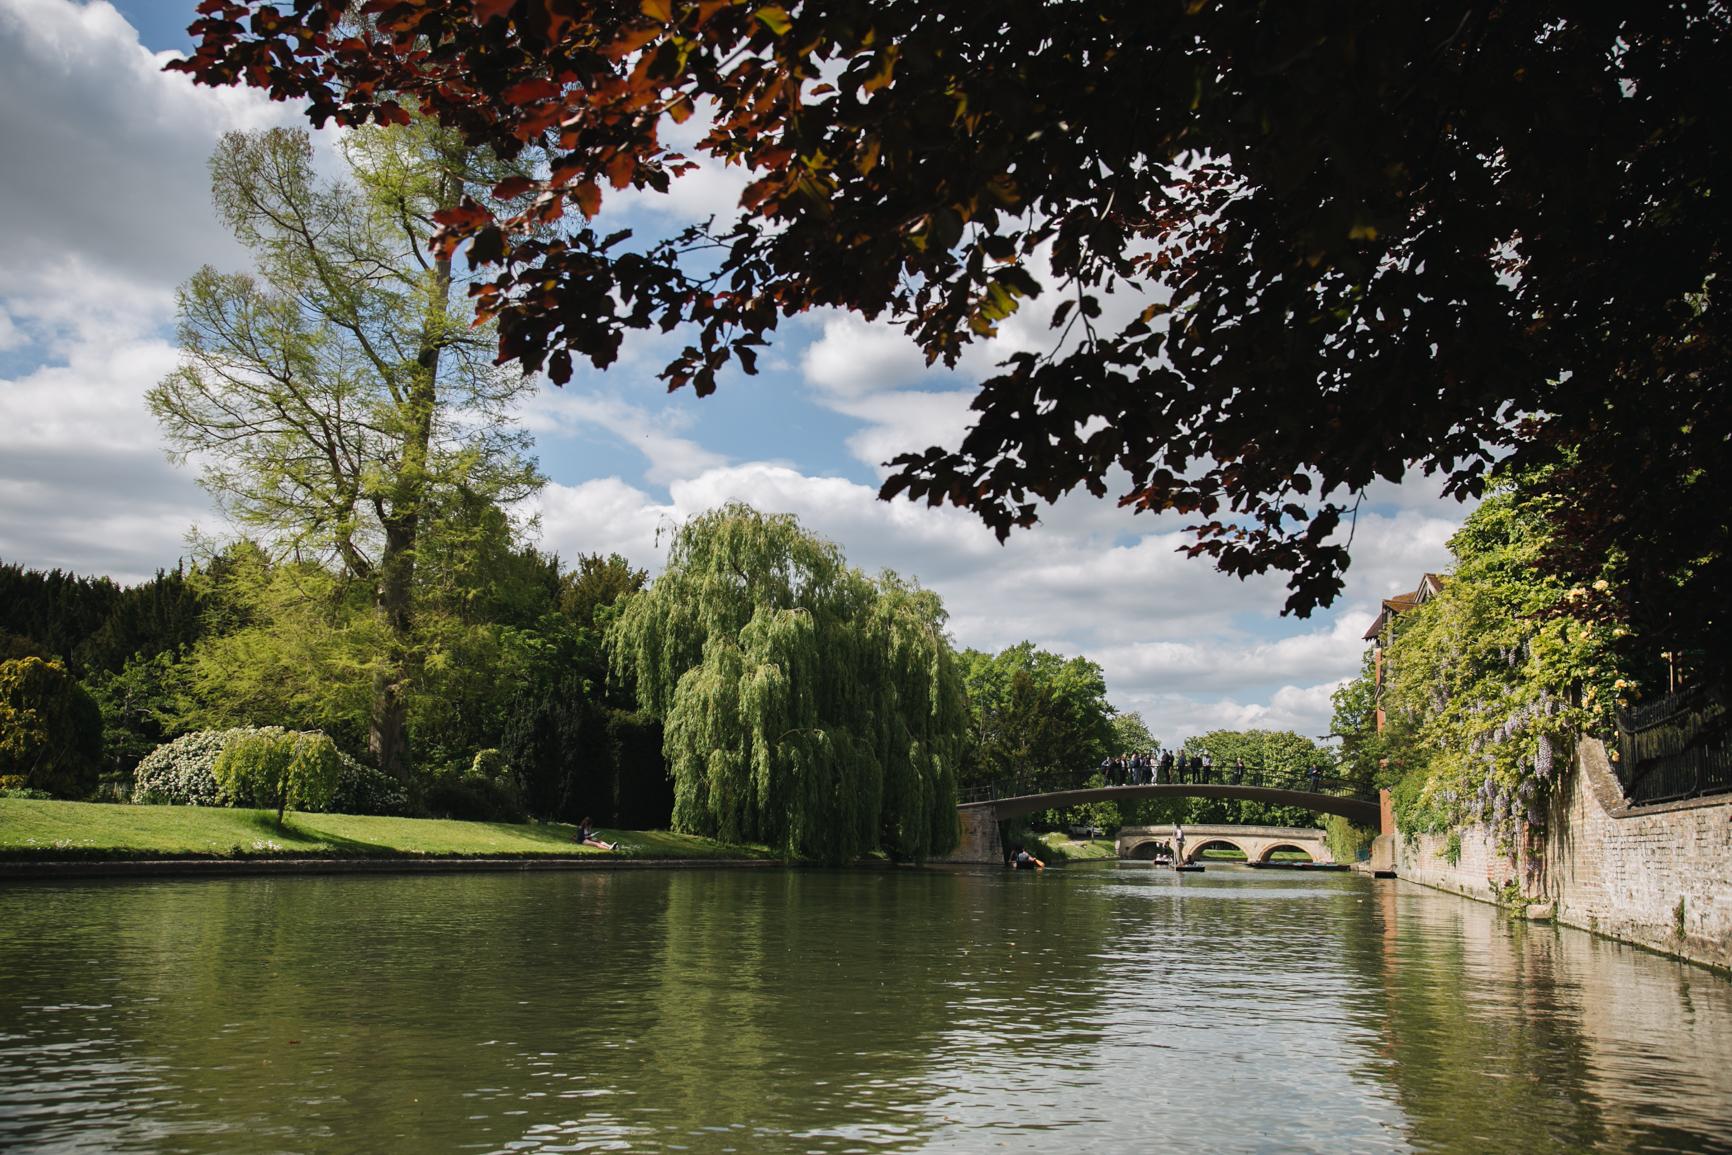 Punting-in-Cambridge-nature-voyage.jpg